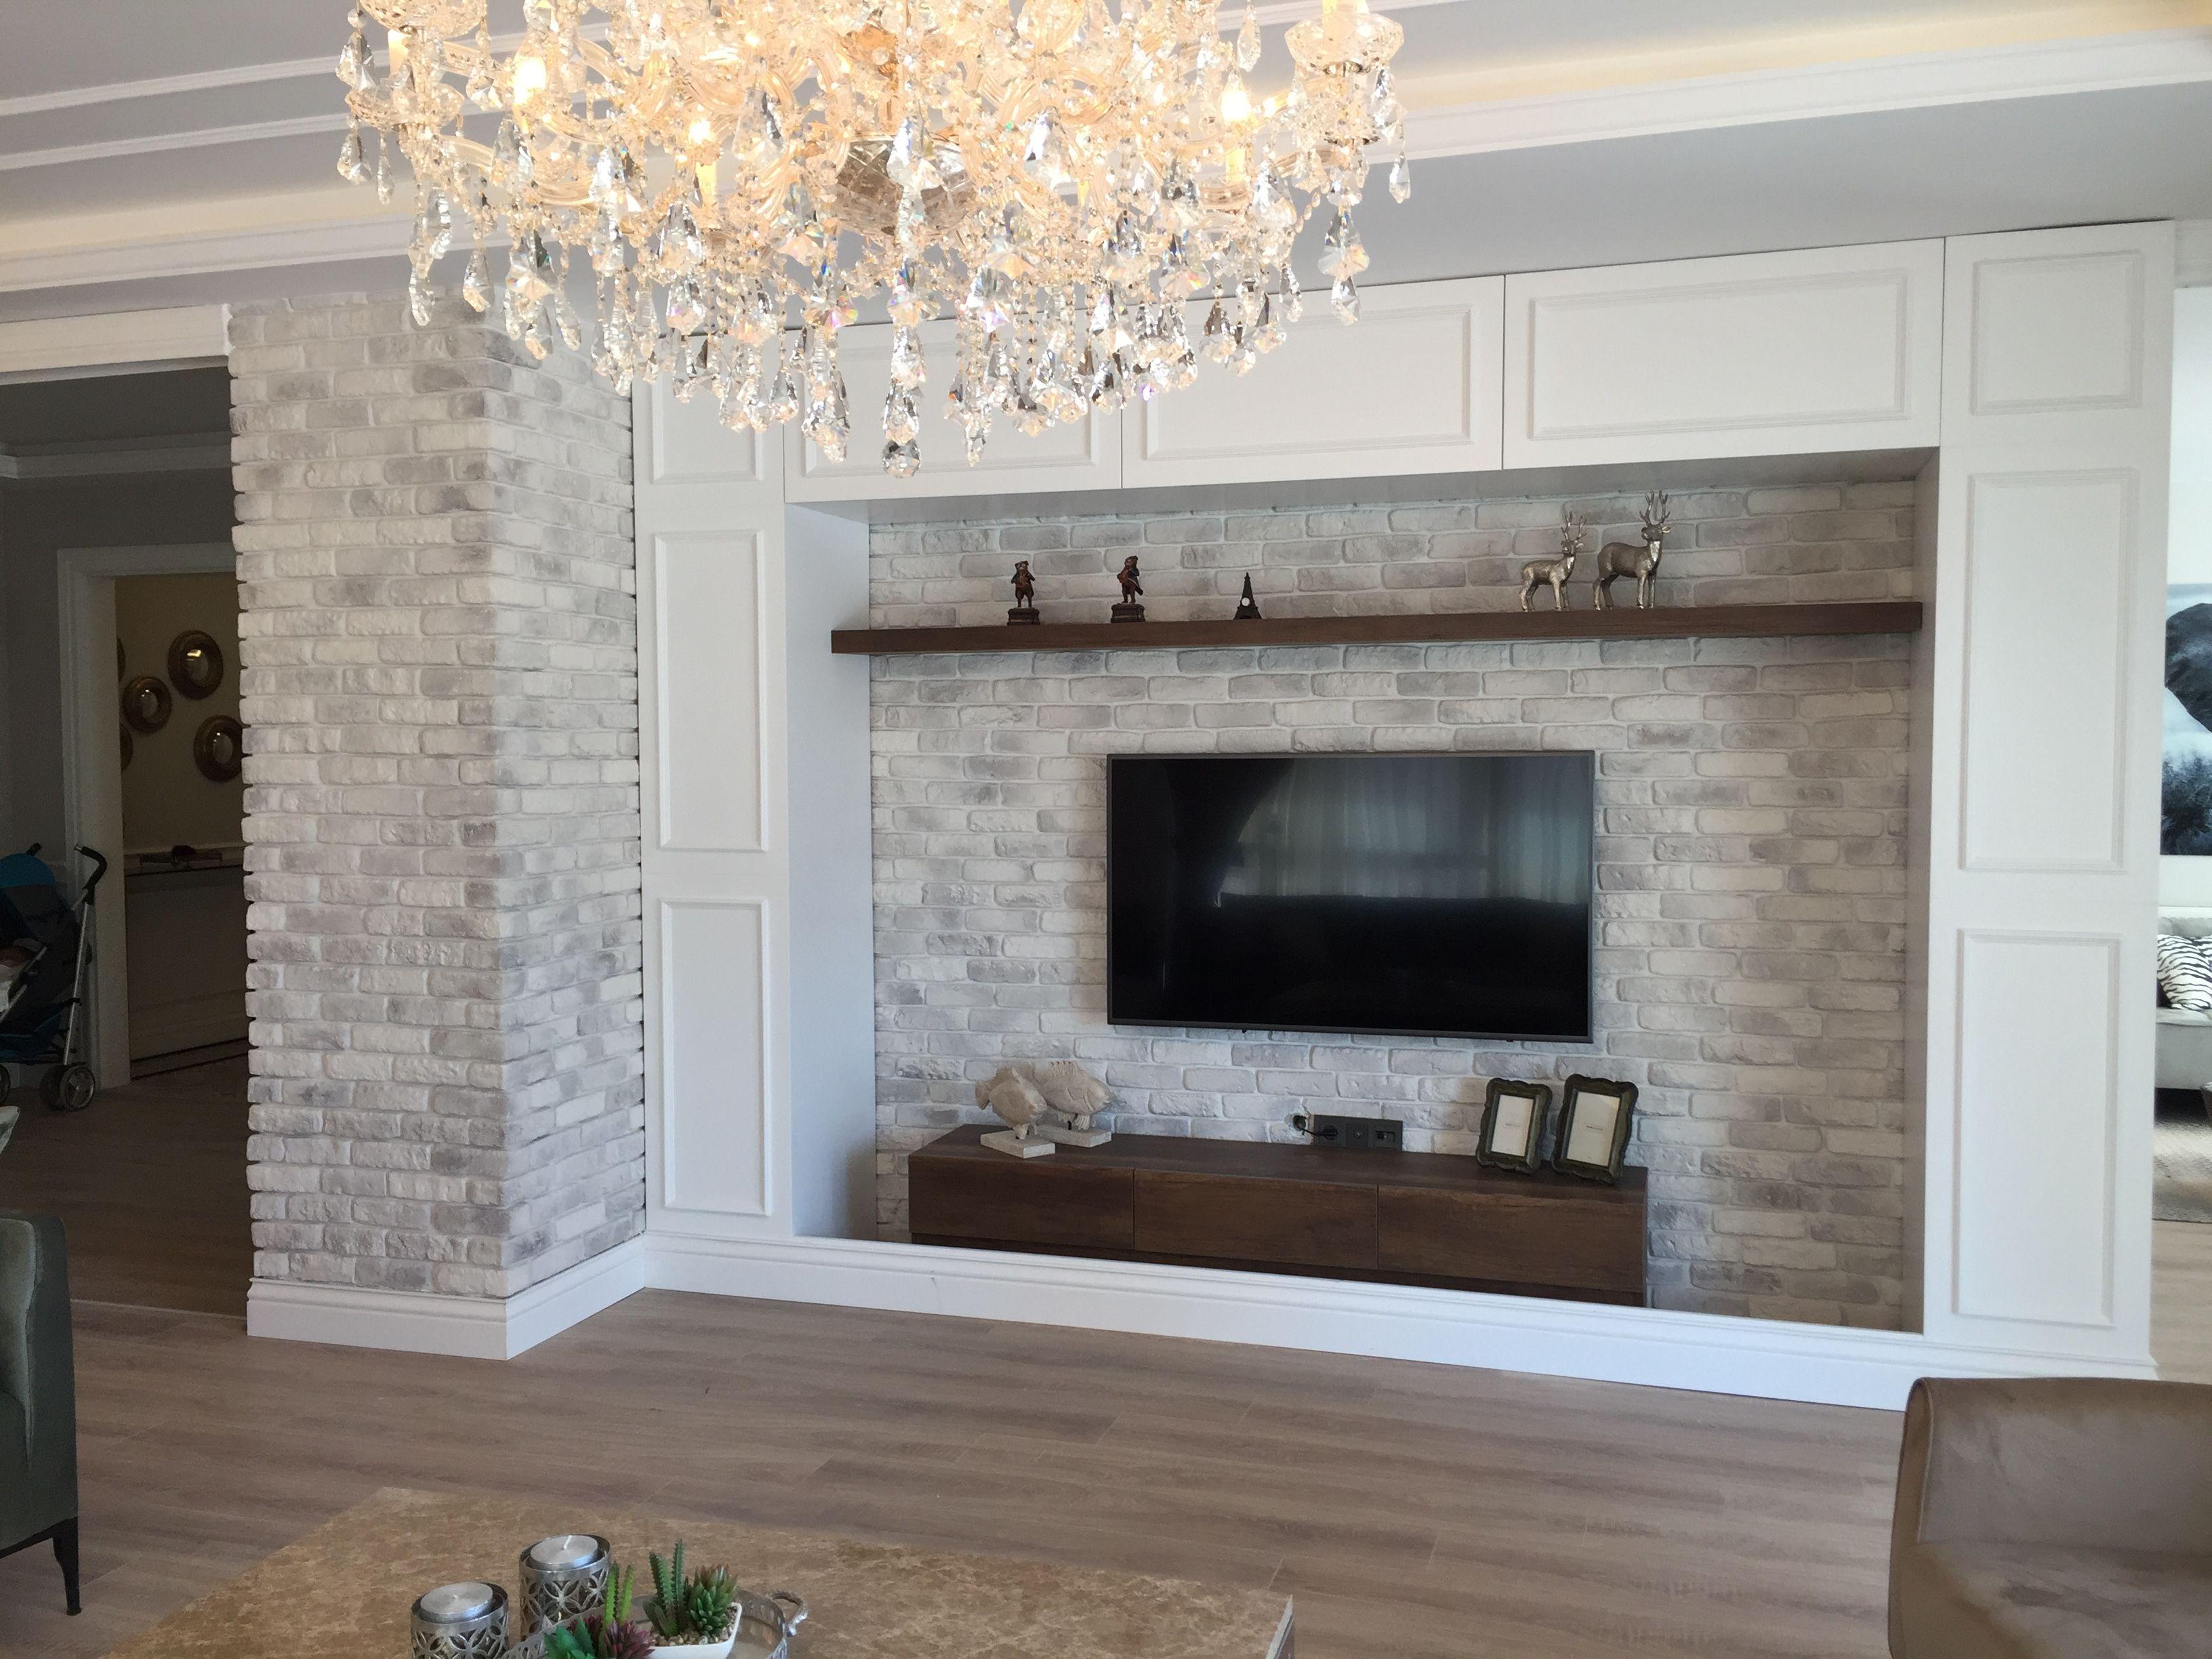 kuhle dekoration tv natursteinwand, taş duvar tasarım tv ünitesi | ev dekorasyon/ home desing, Innenarchitektur